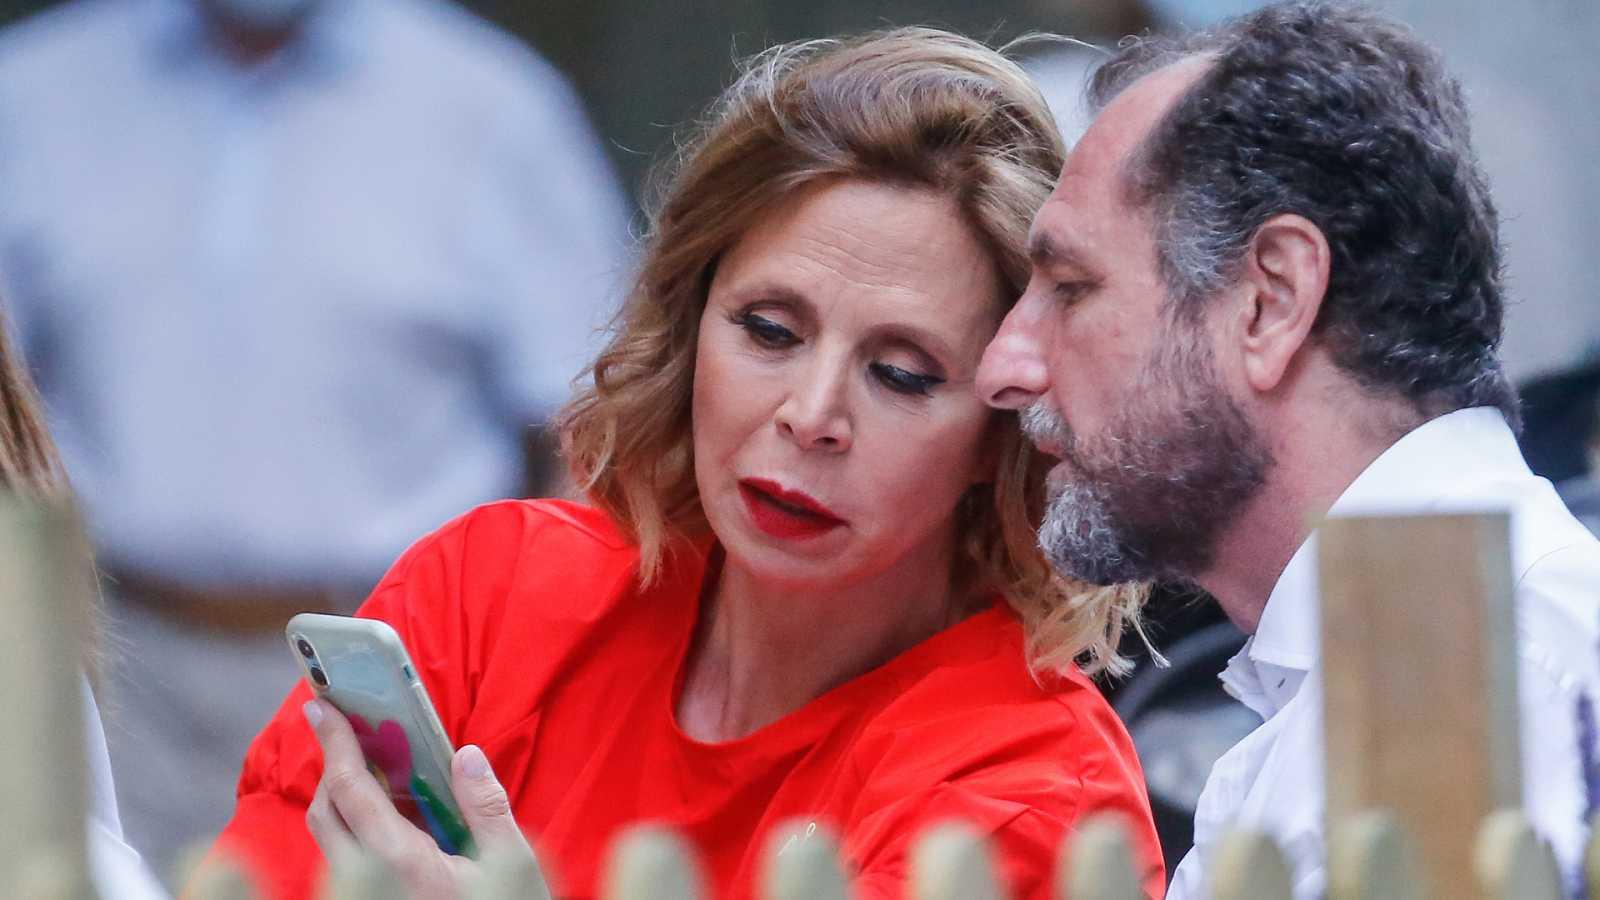 Ágatha Ruiz de la Prada, enamorada de nuevo